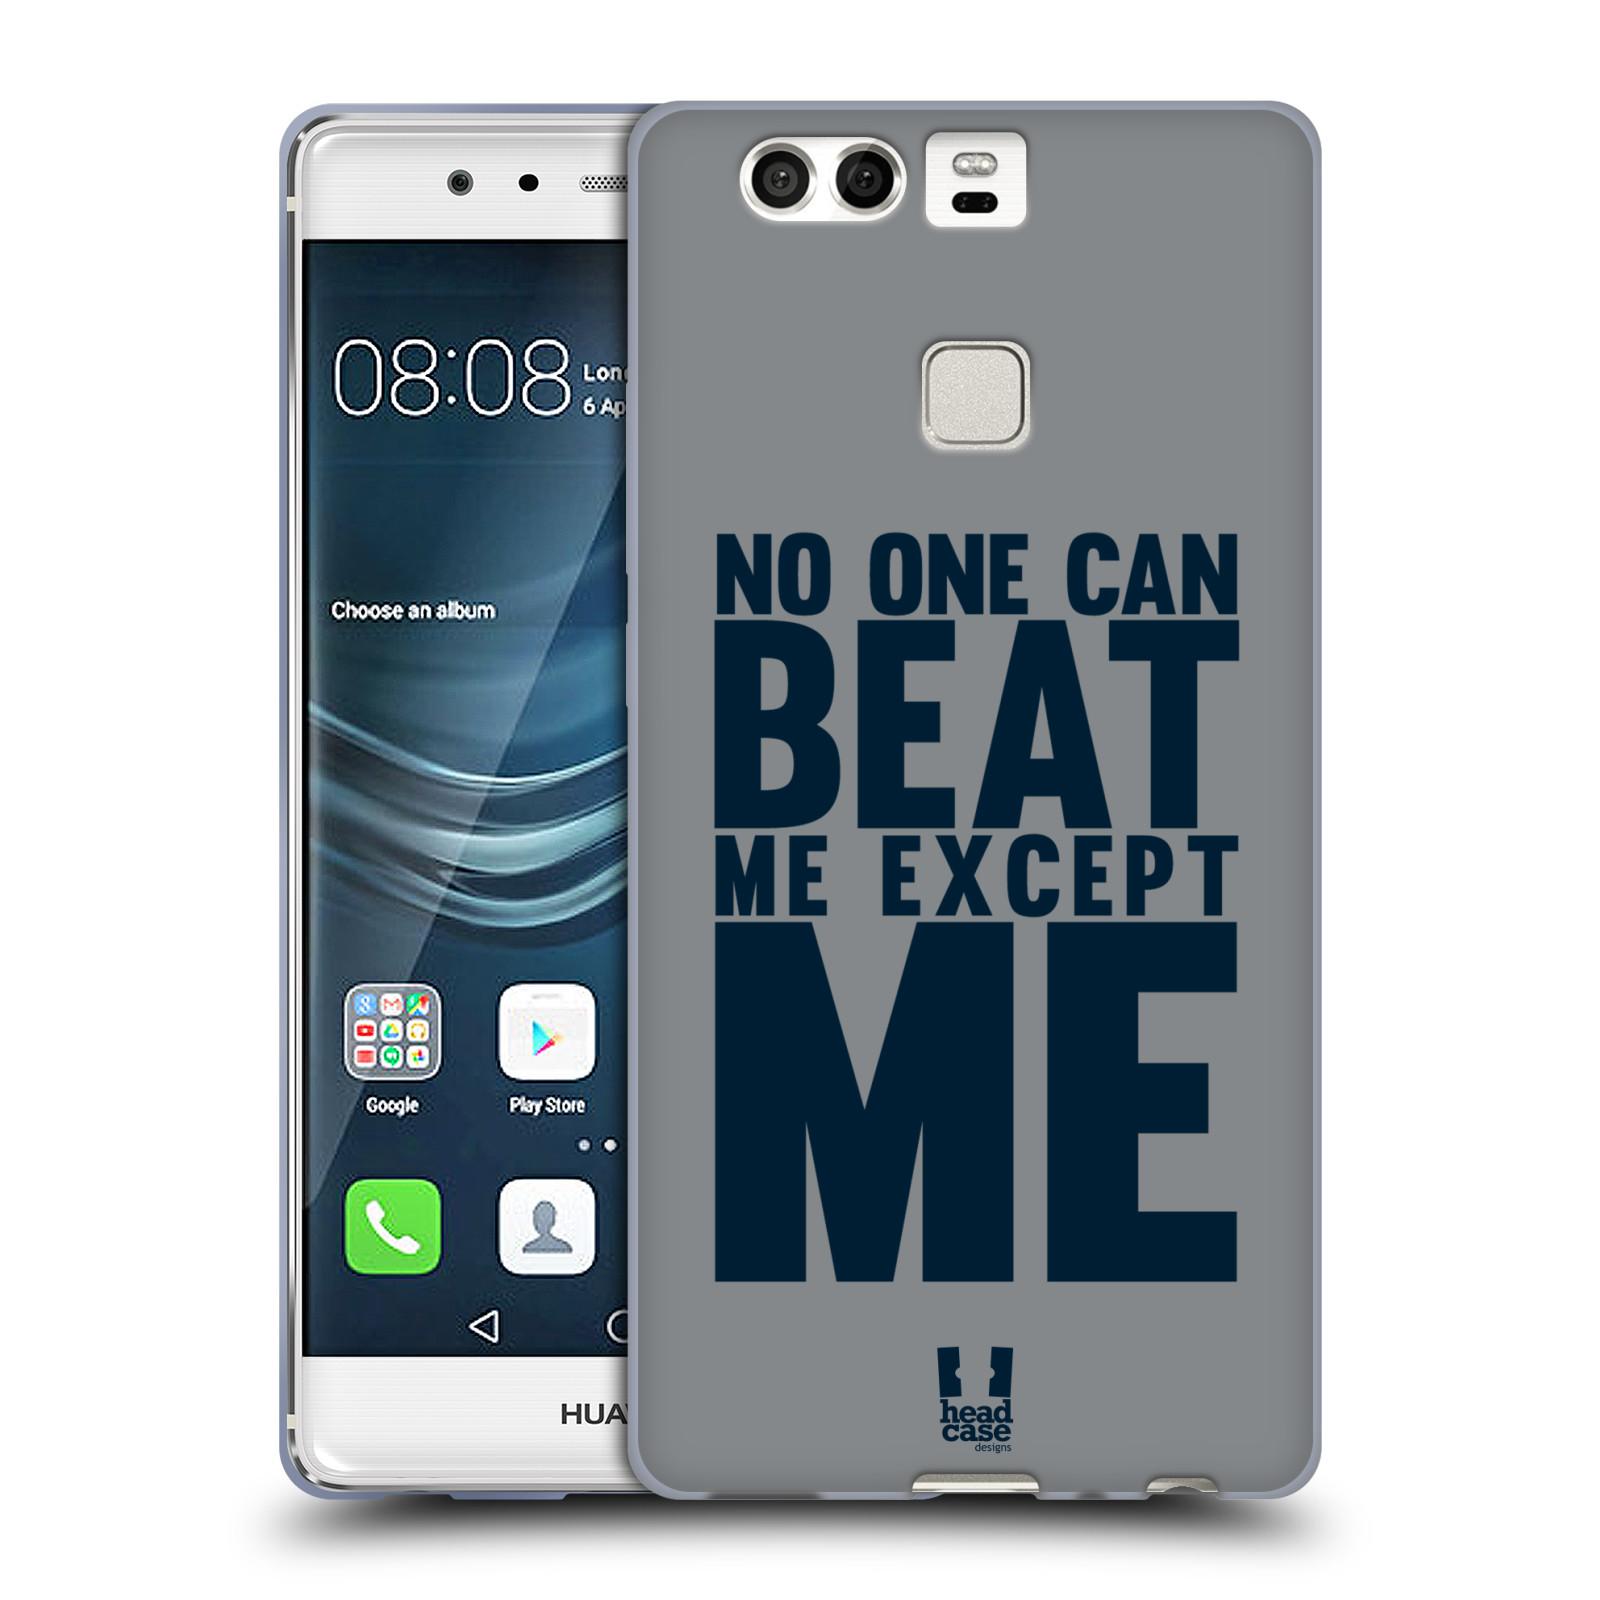 HEAD CASE silikonový obal na mobil Huawei P9 / P9 DUAL SIM Sportovní tématika síla vůle Beat ME